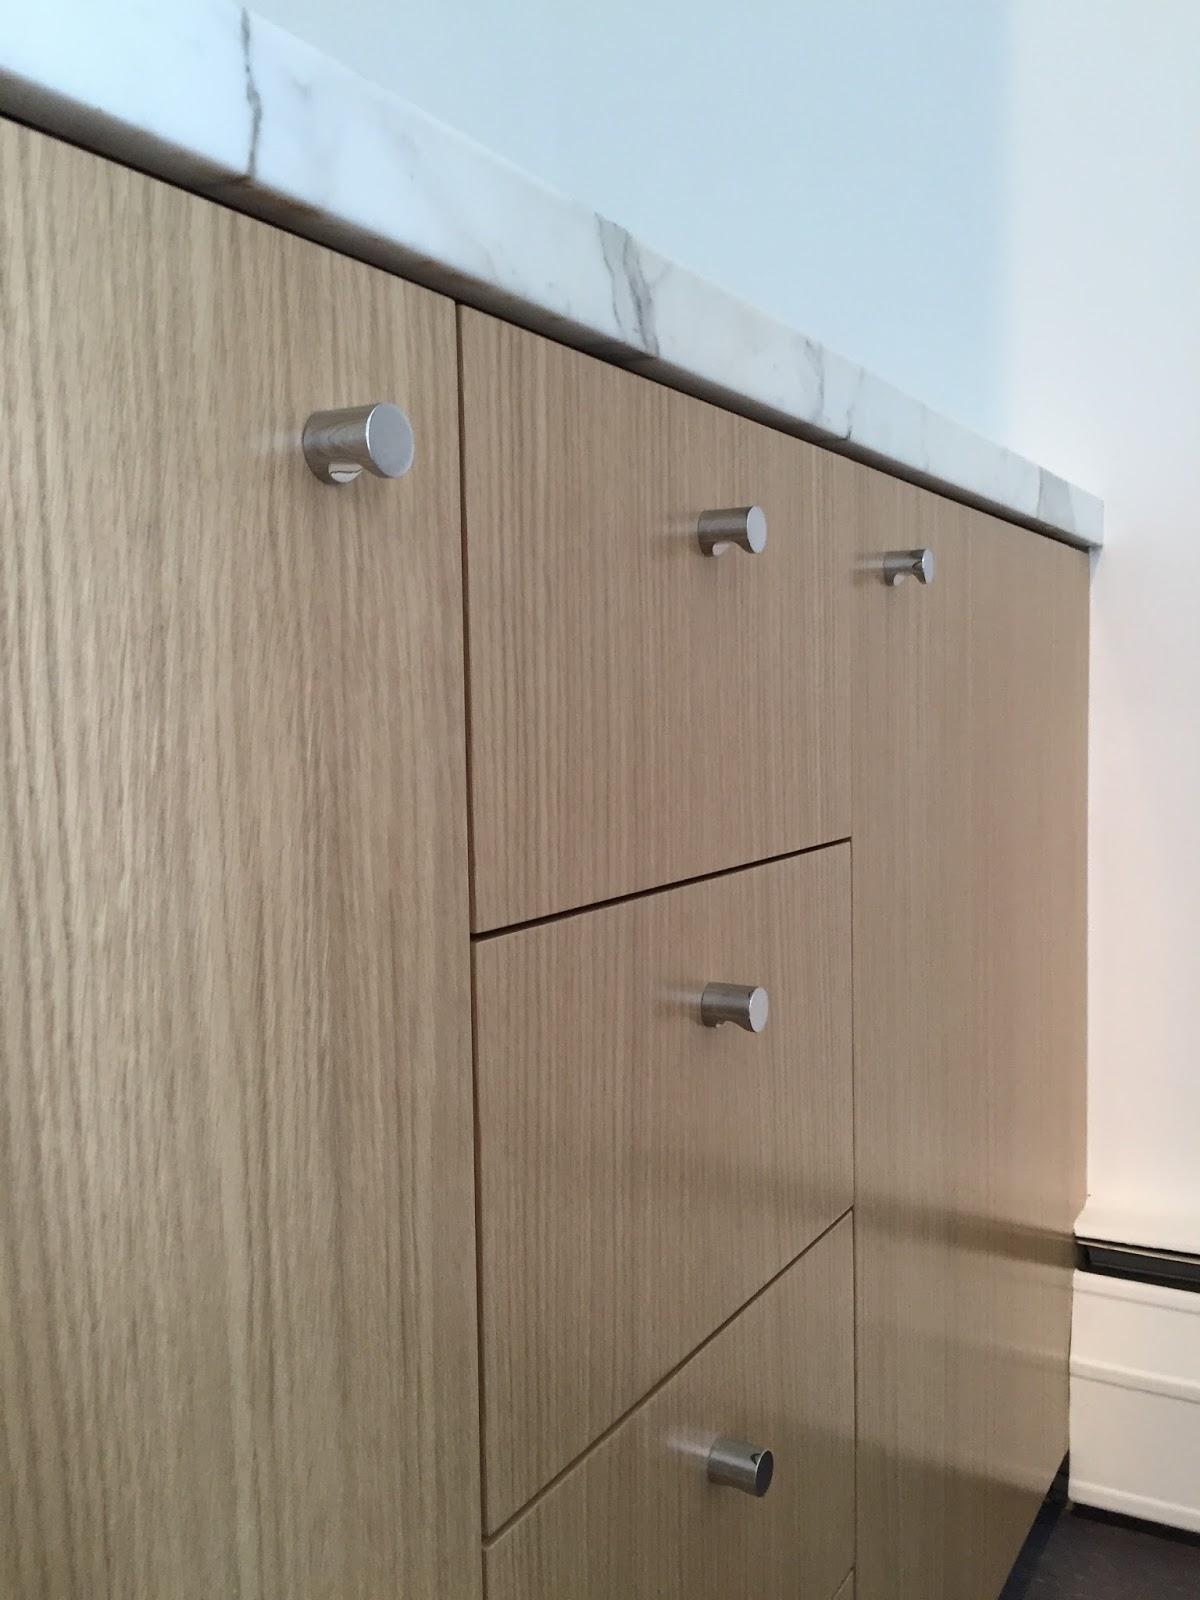 Rift Sawn Oak Cabinets Jy85 Roccommunity